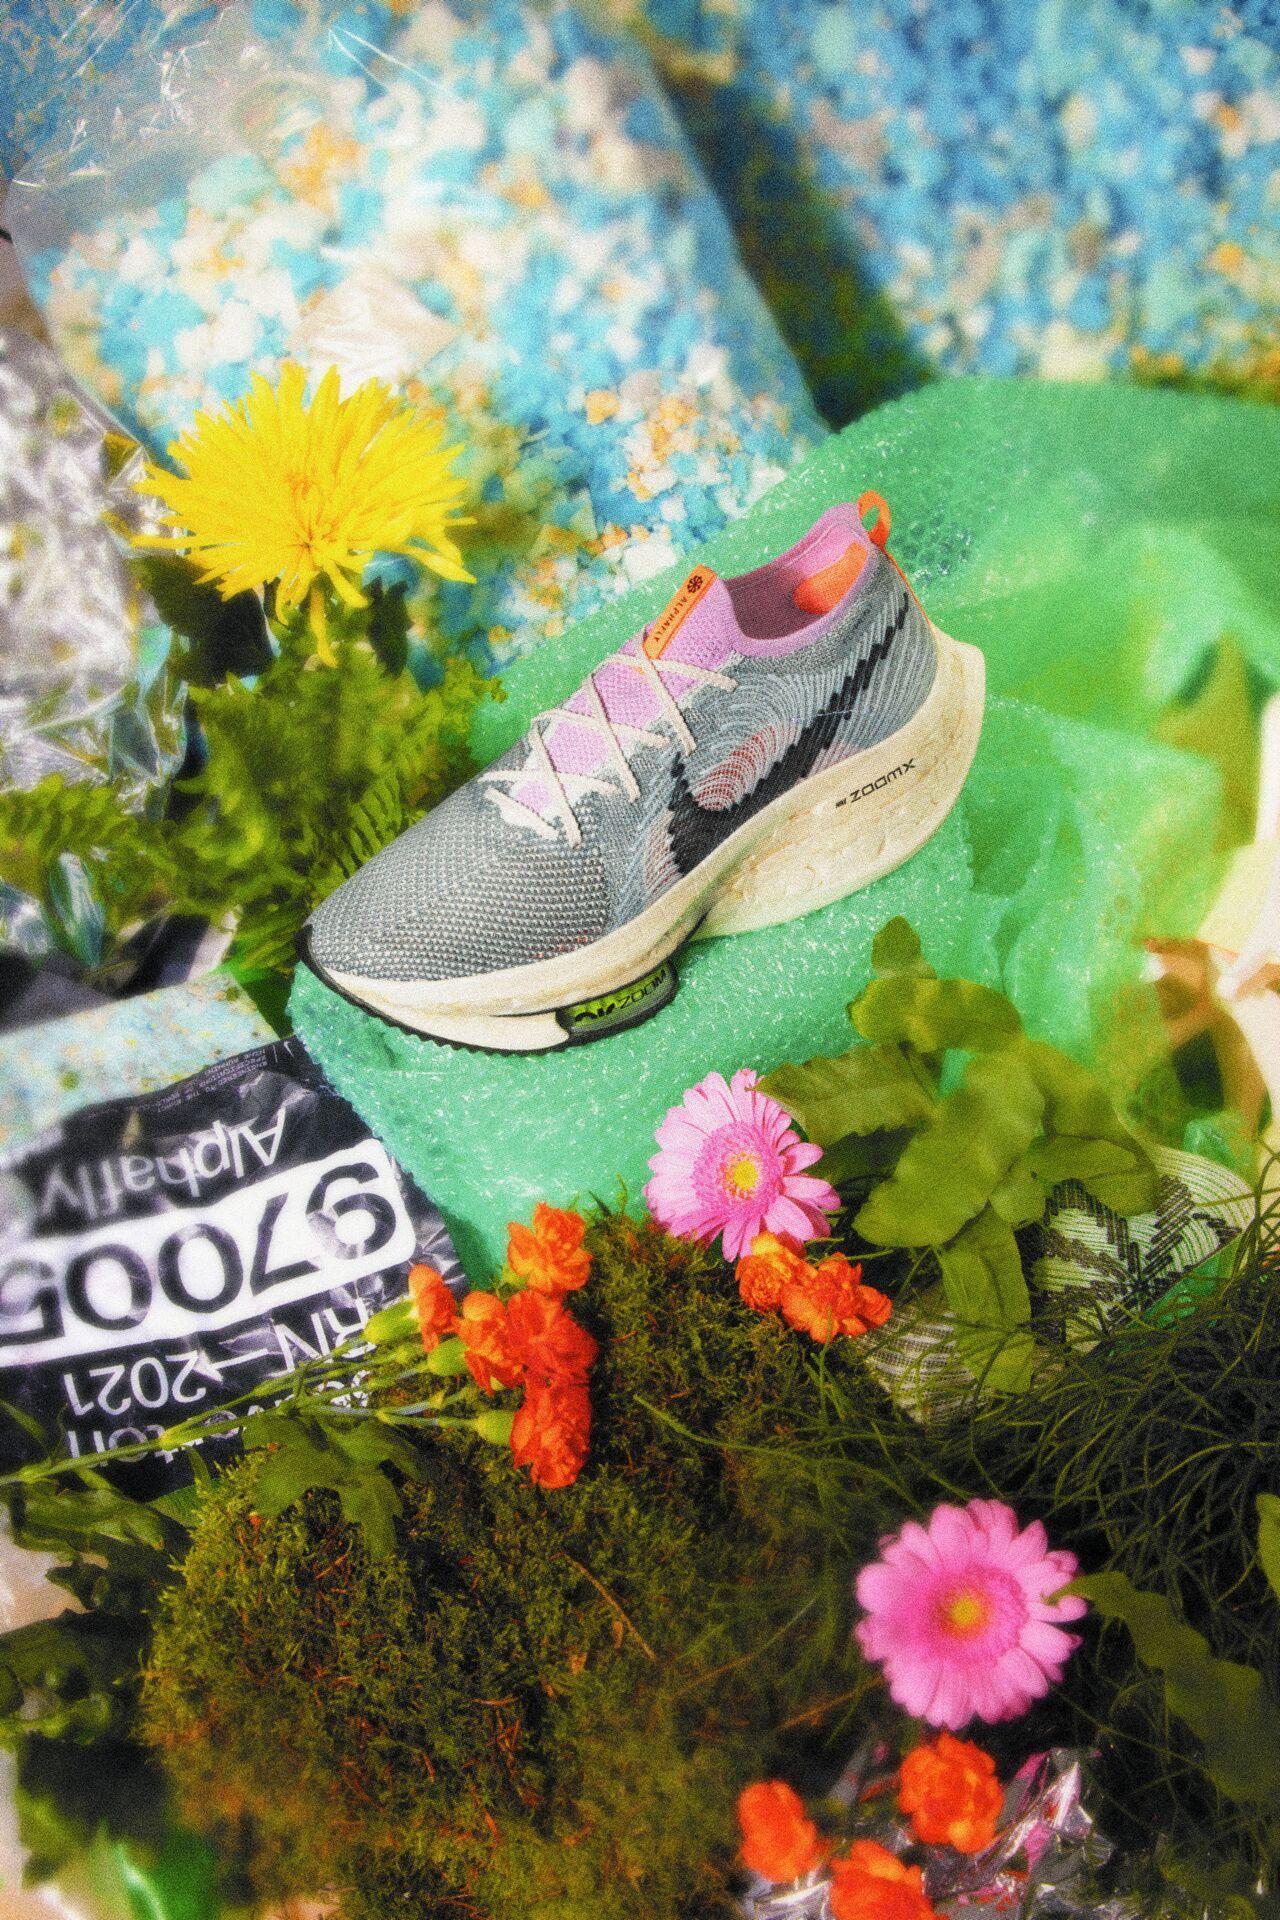 Nike,Zoom Alphafly,Next Nature  Nike 最强垃圾鞋!「破 2 神鞋」新版本刚刚曝光!